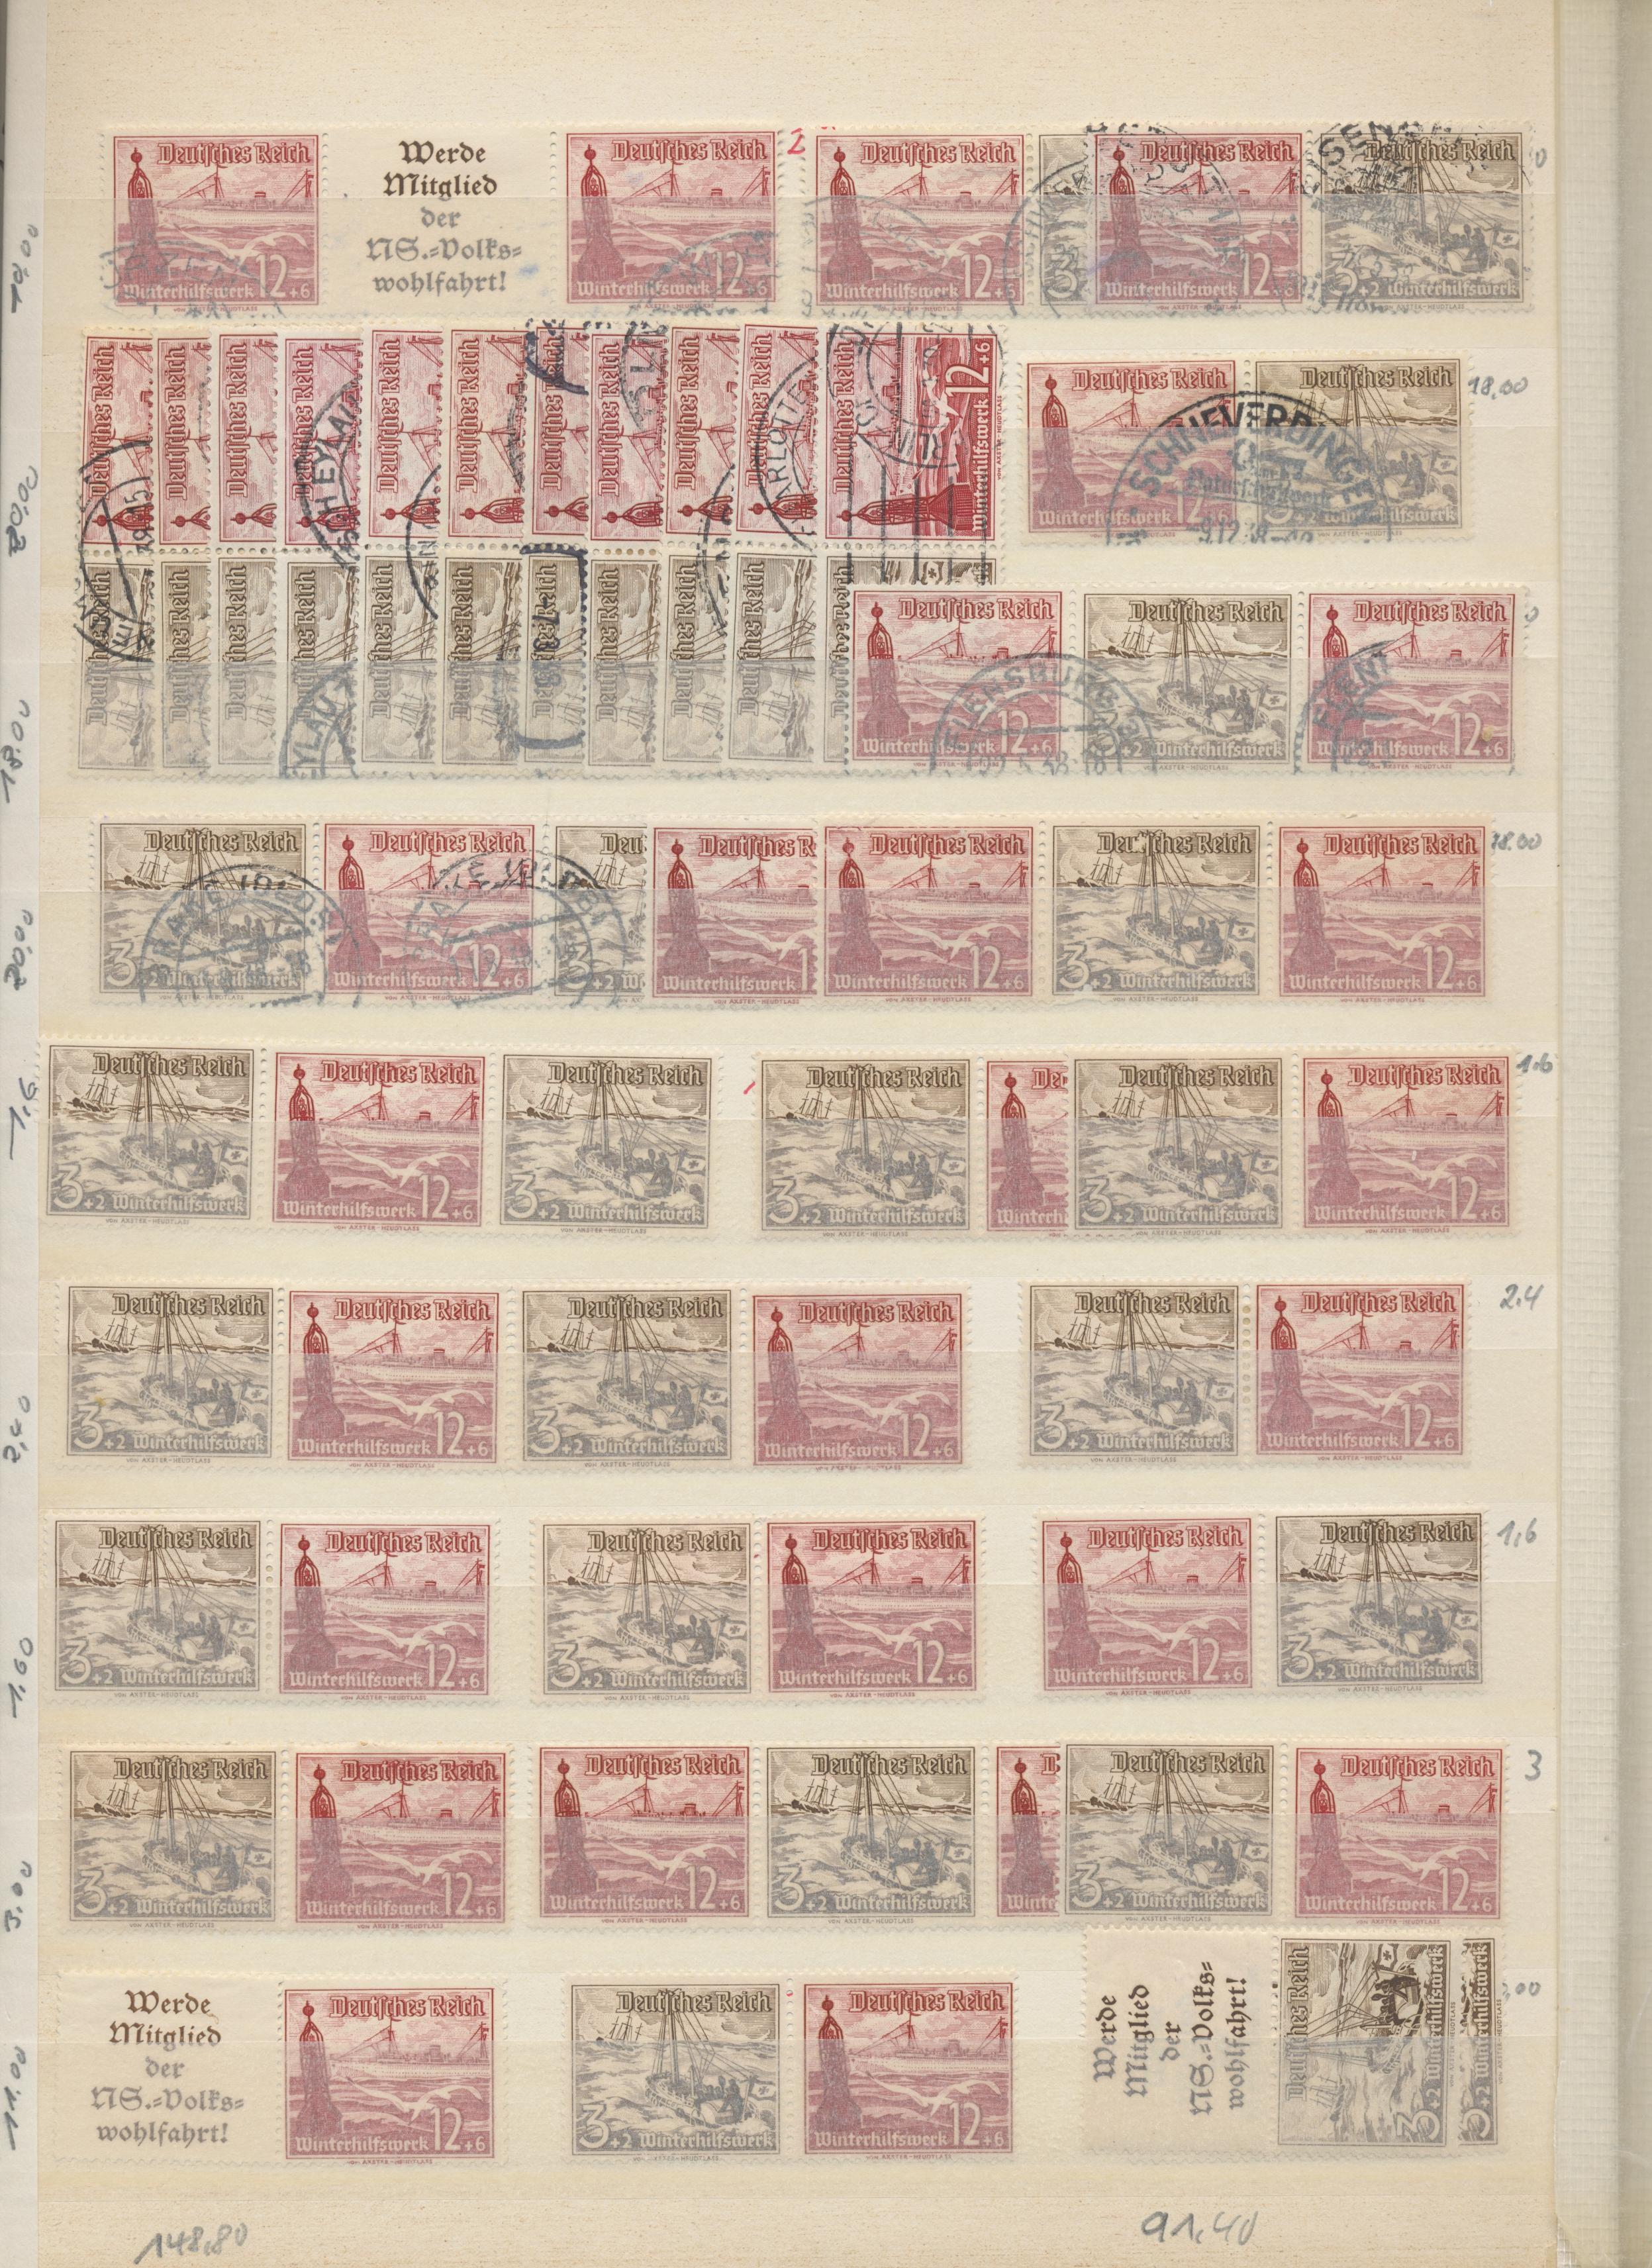 Lot 28627 - Deutsches Reich - Zusammendrucke  -  Auktionshaus Christoph Gärtner GmbH & Co. KG Sale #46 Gollcetions Germany - including the suplement